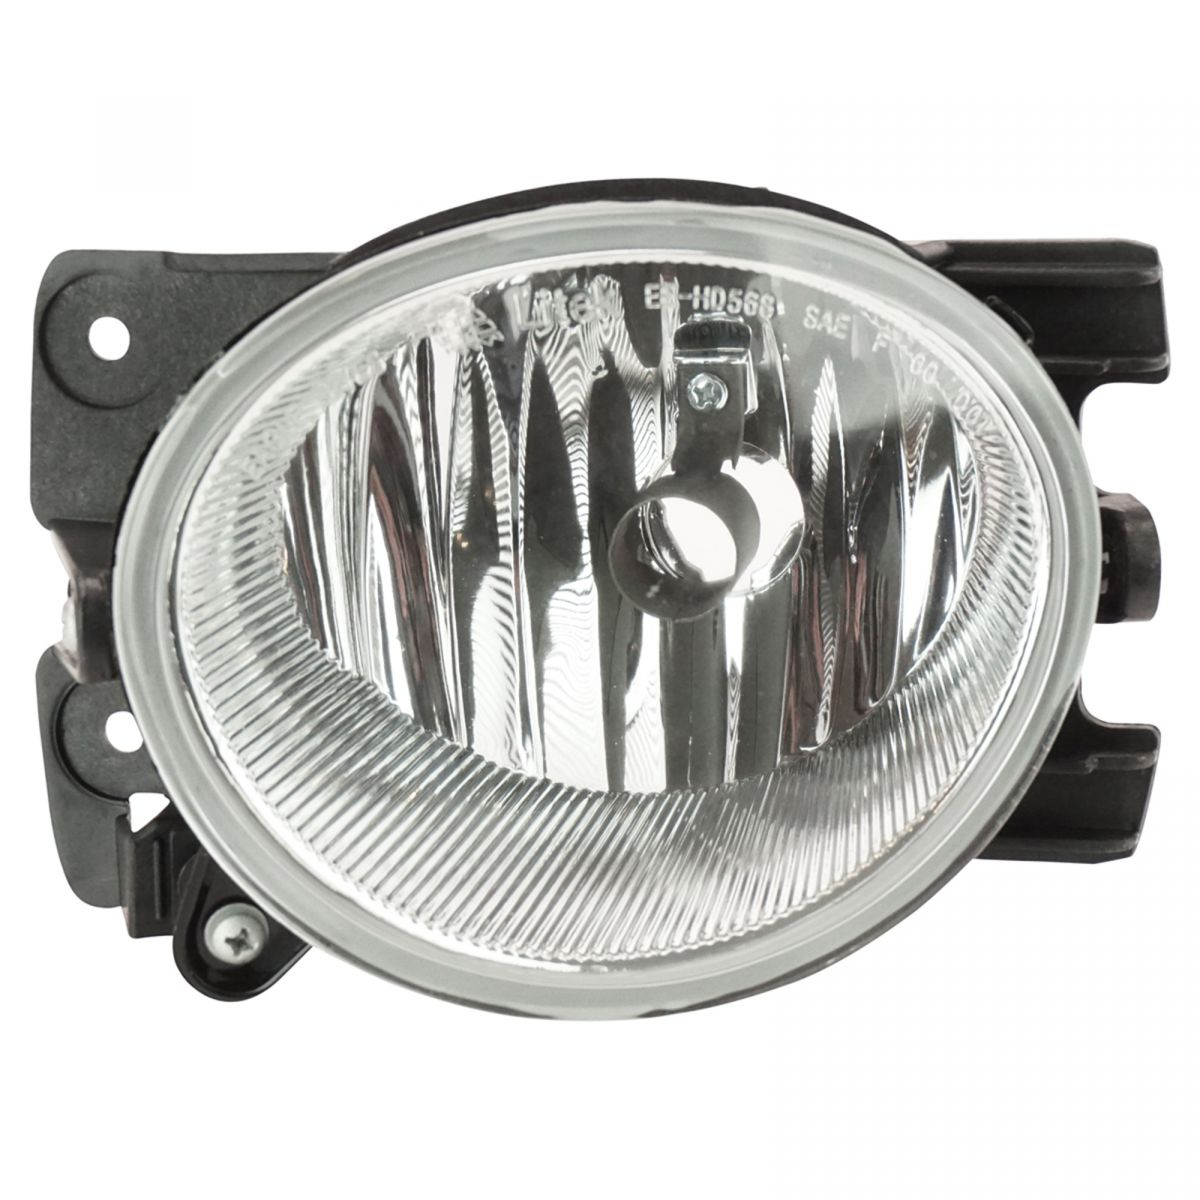 Fog Lamp Driving Light Driver Side Left LH for 09-11 Acura TL New